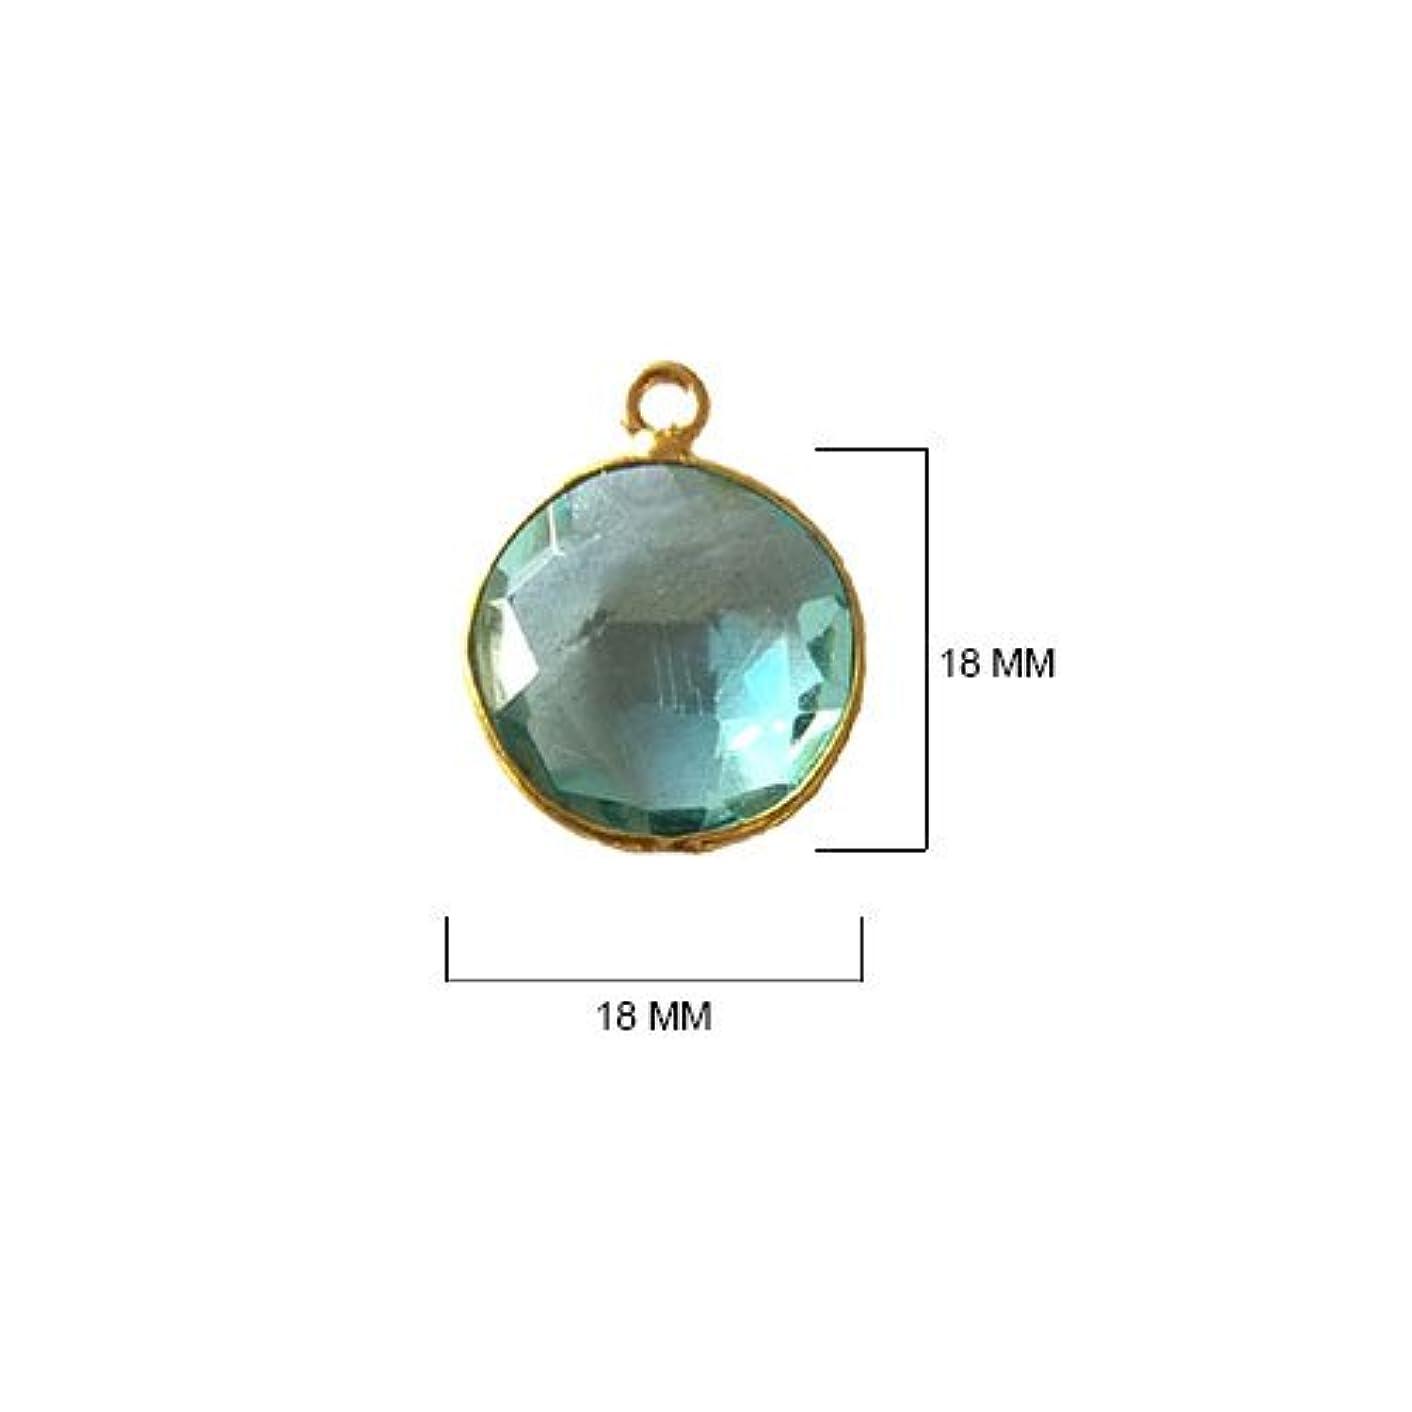 2 Pcs Aquamarine Coin Beads 18mm 24K Gold Vermeil by BESTINBEADS, Aquamarine Hydro Quartz Coin Pendant Bezel Gemstone Connectors Over 925 Sterling Silver Bezel Jewelry Making Supplies